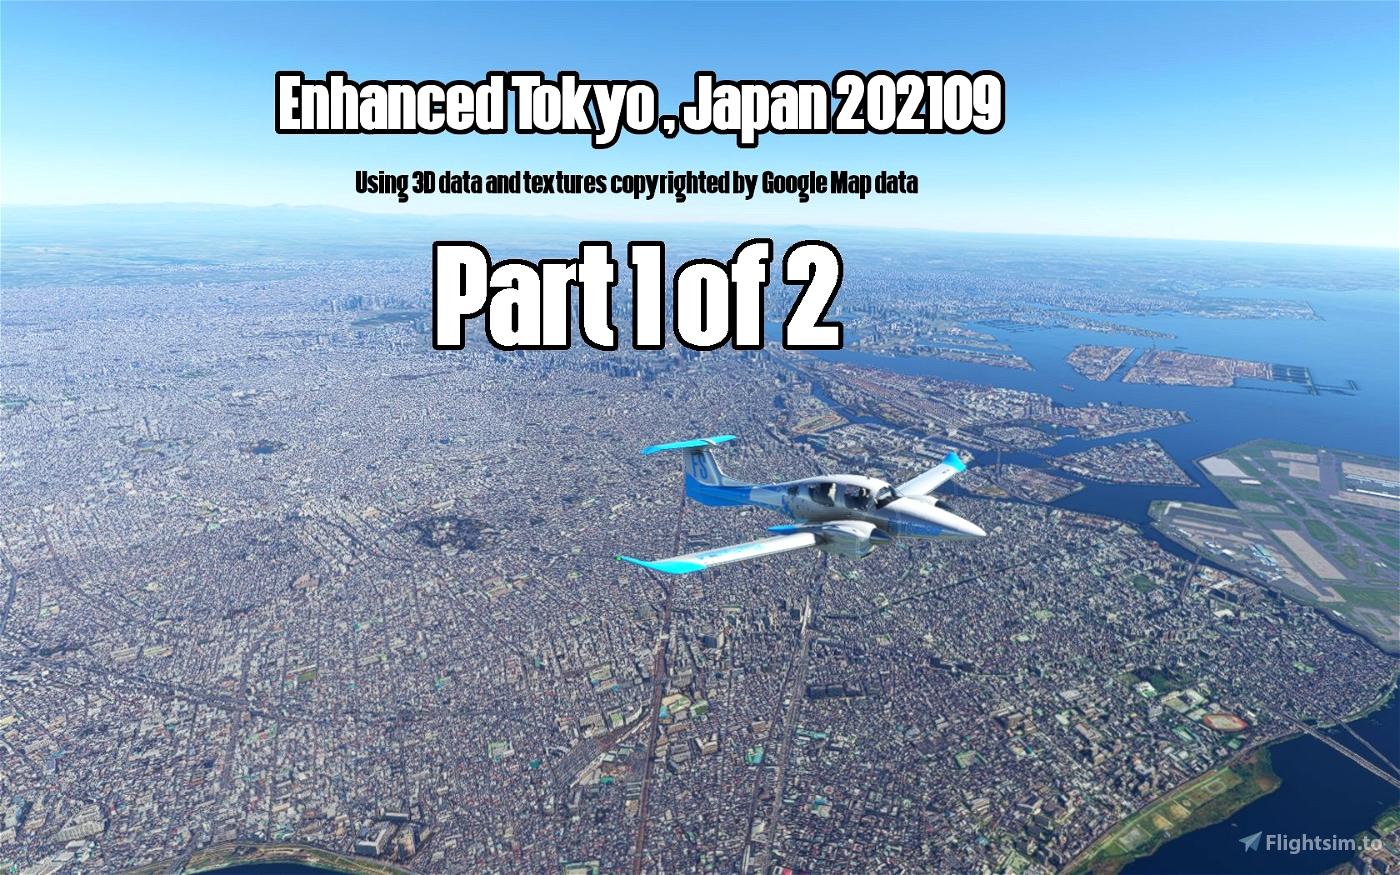 Enhanced Tokyo, Japan 202109 Part 1 of 2 Microsoft Flight Simulator